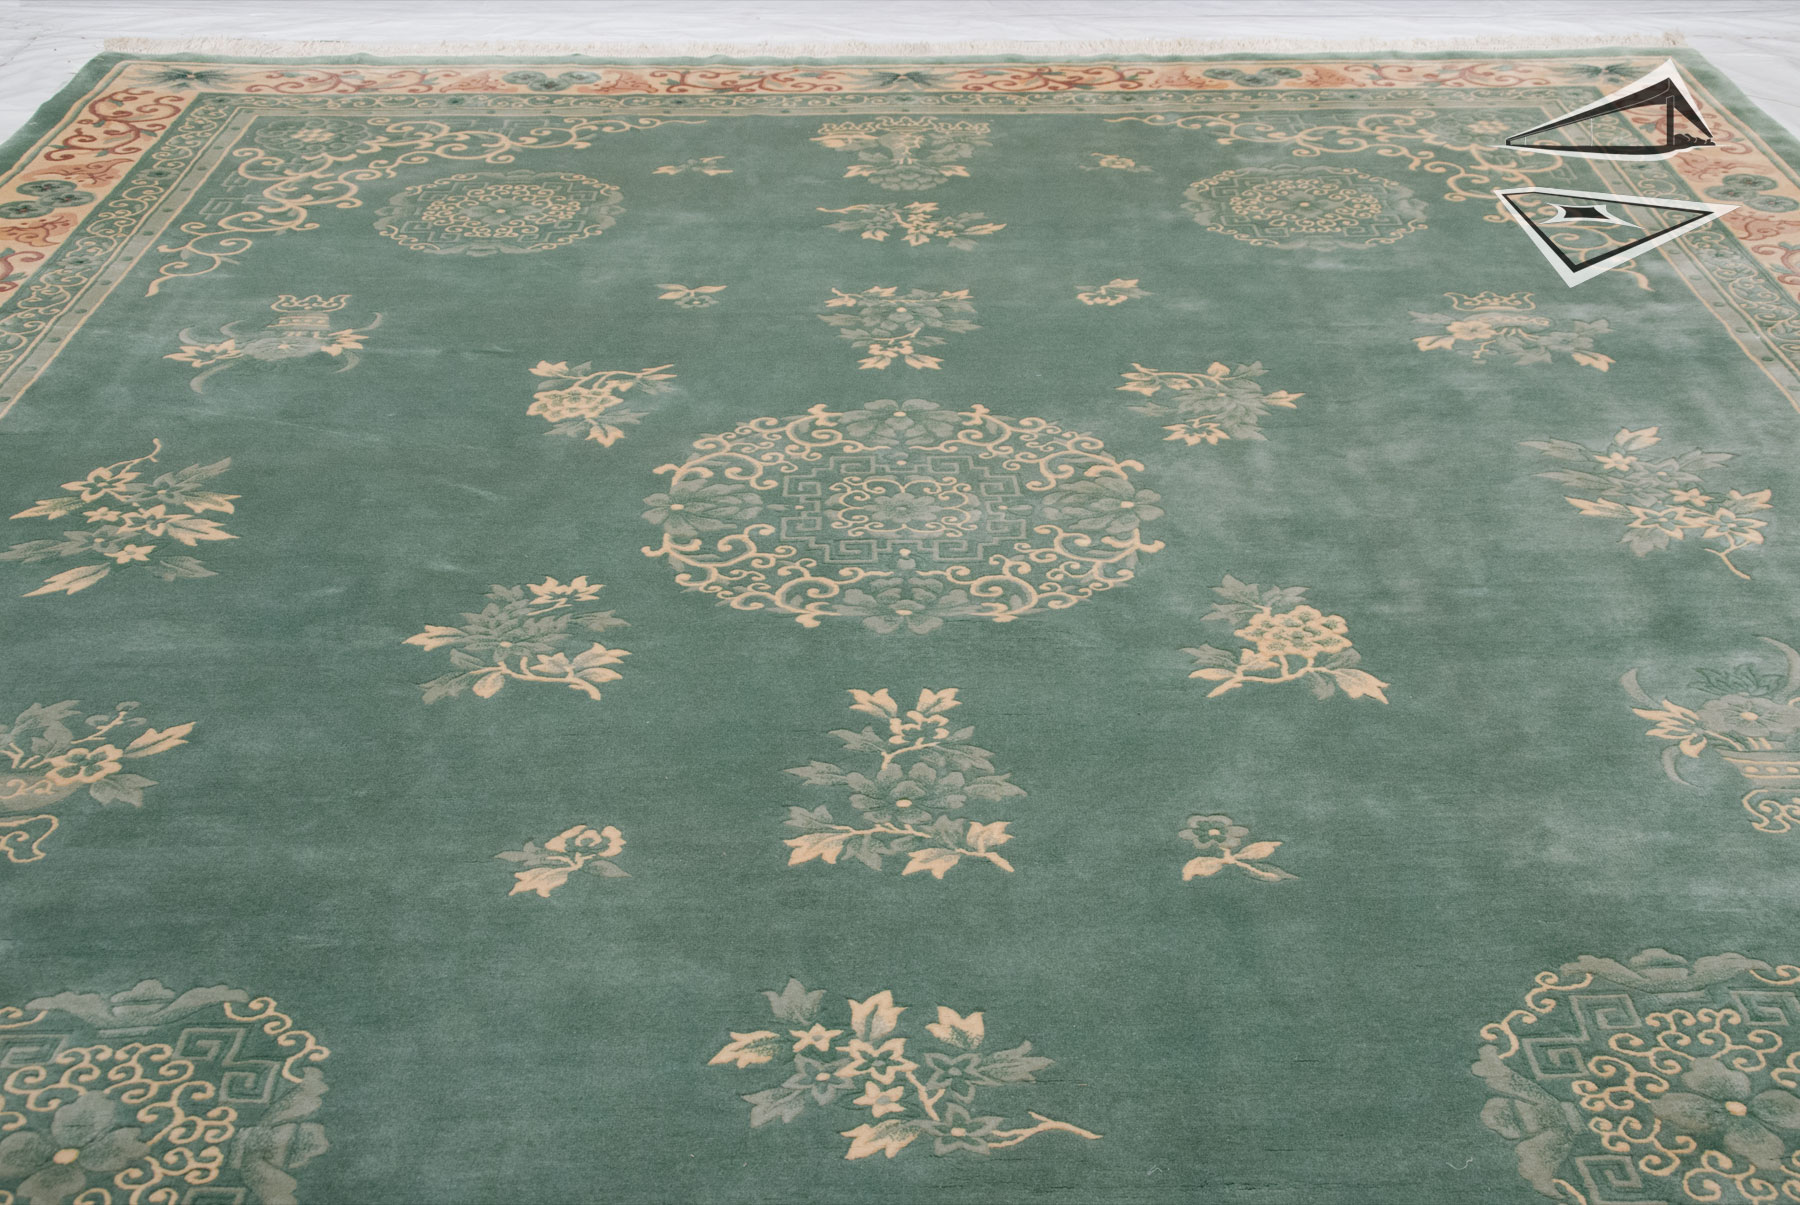 carpet 15 x 15. peking design oversize carpet 12\u2032 0\u2033 x 15\u2032 15